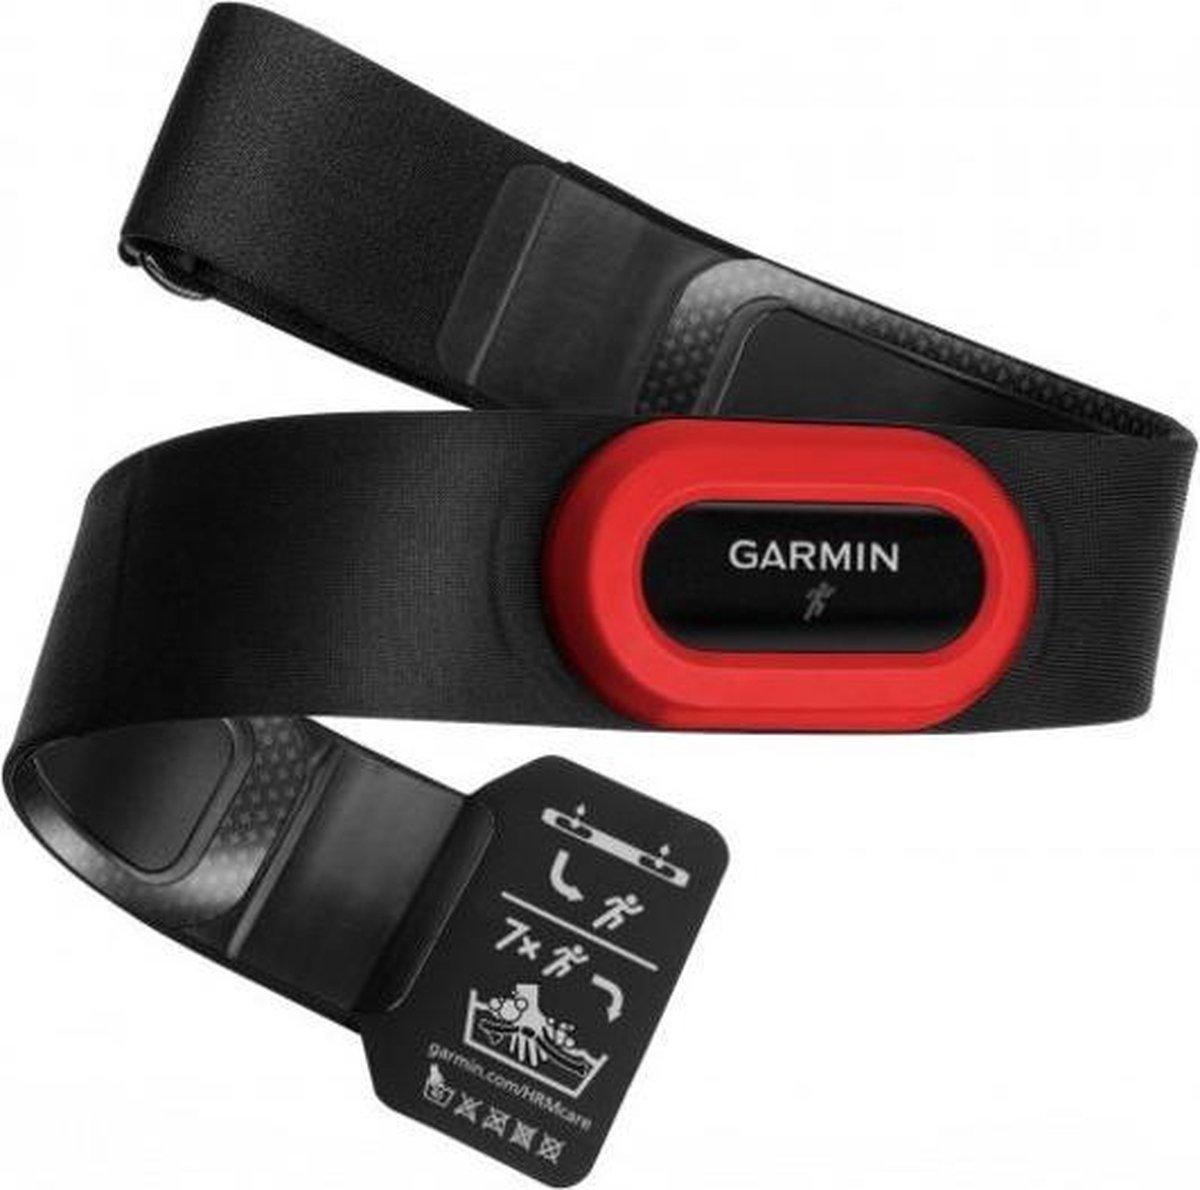 Garmin HRM Run hartslag monitor Borst. Zwart, Rood